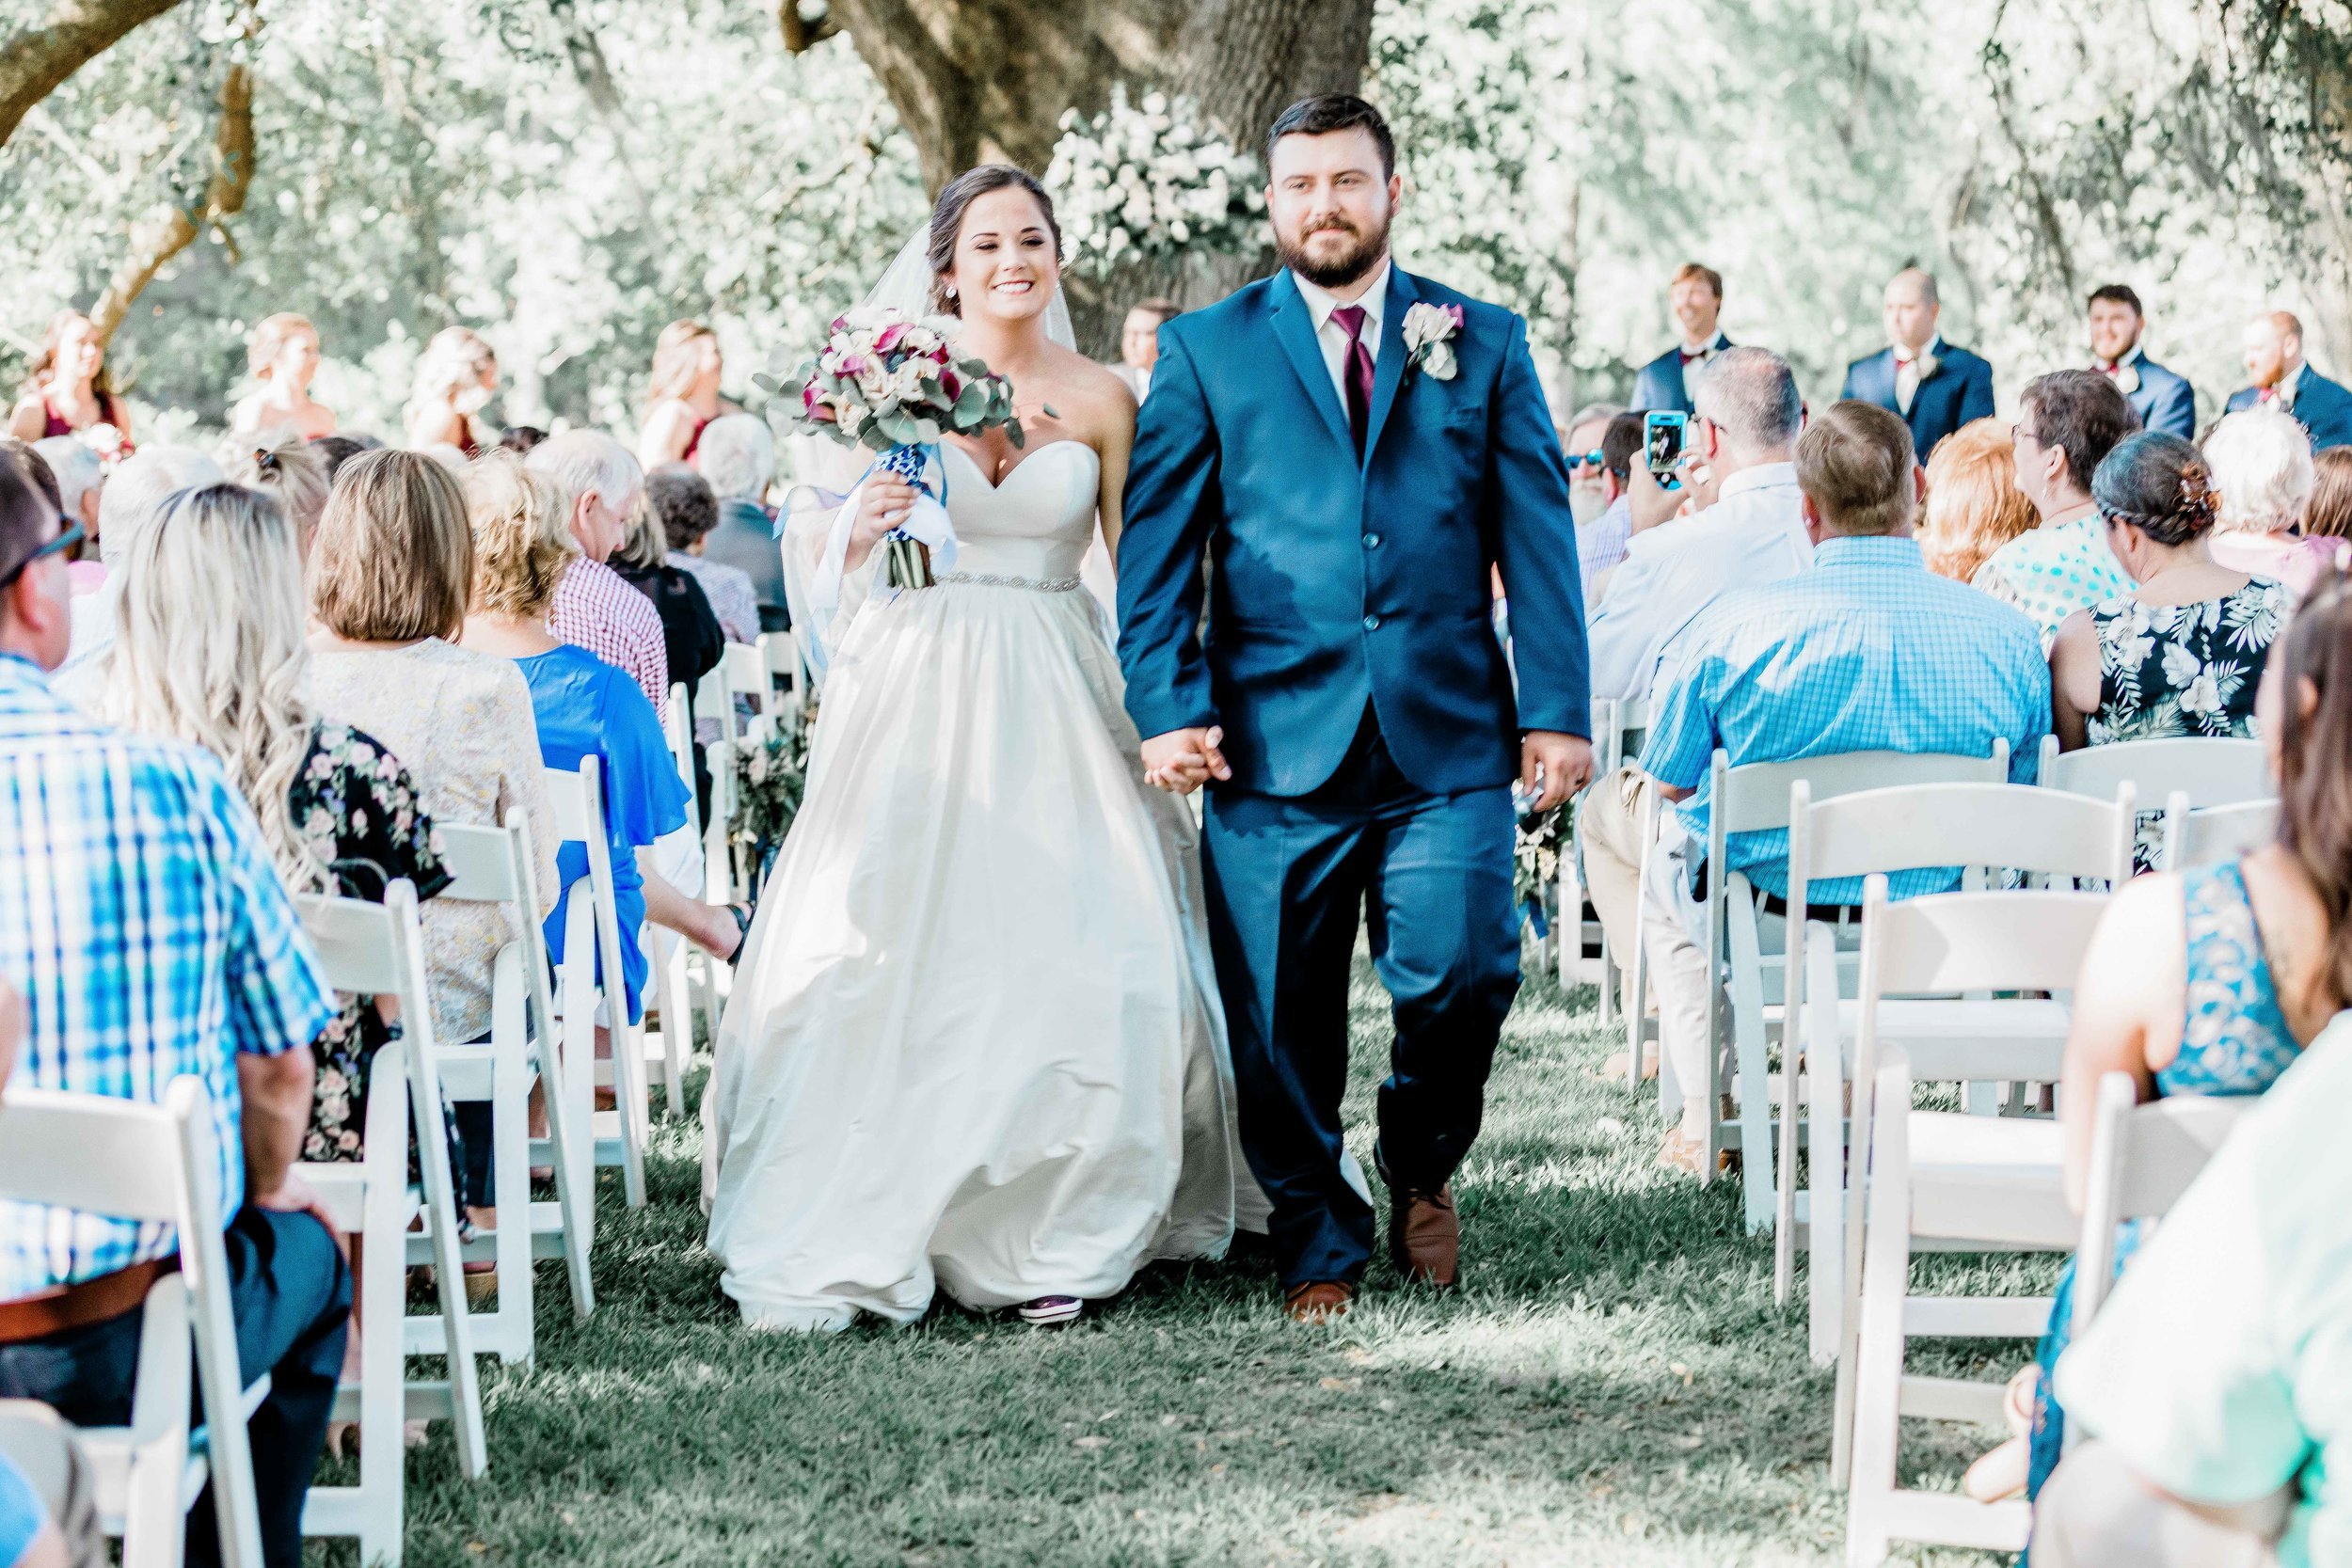 20190427-Southern Lens Photography- Savannah Wedding Photographer-Screven and Caroline-201970.jpg